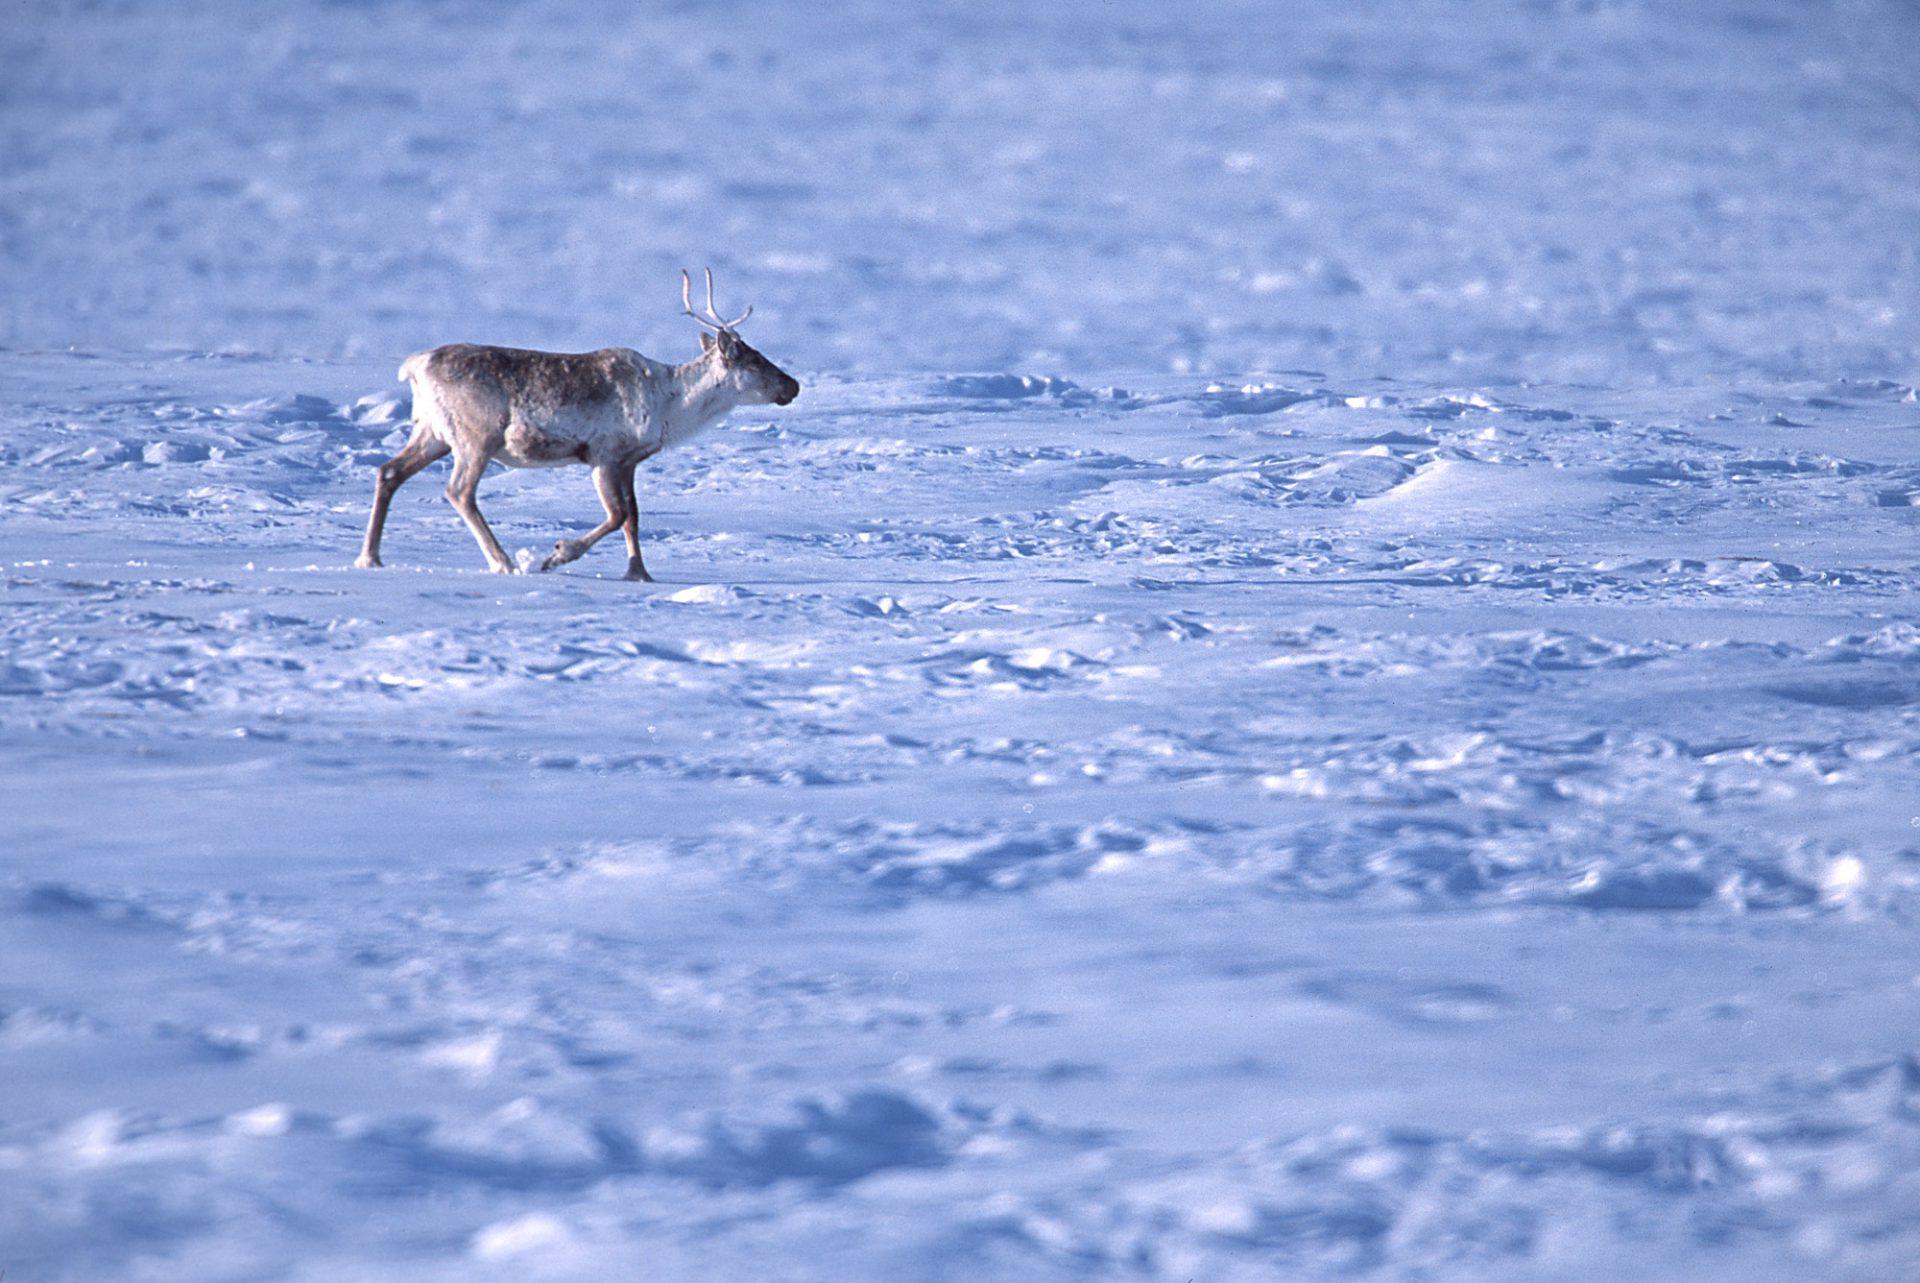 Photo: Caribou graze amid industrial development in Prudhoe Bay, Alaska.